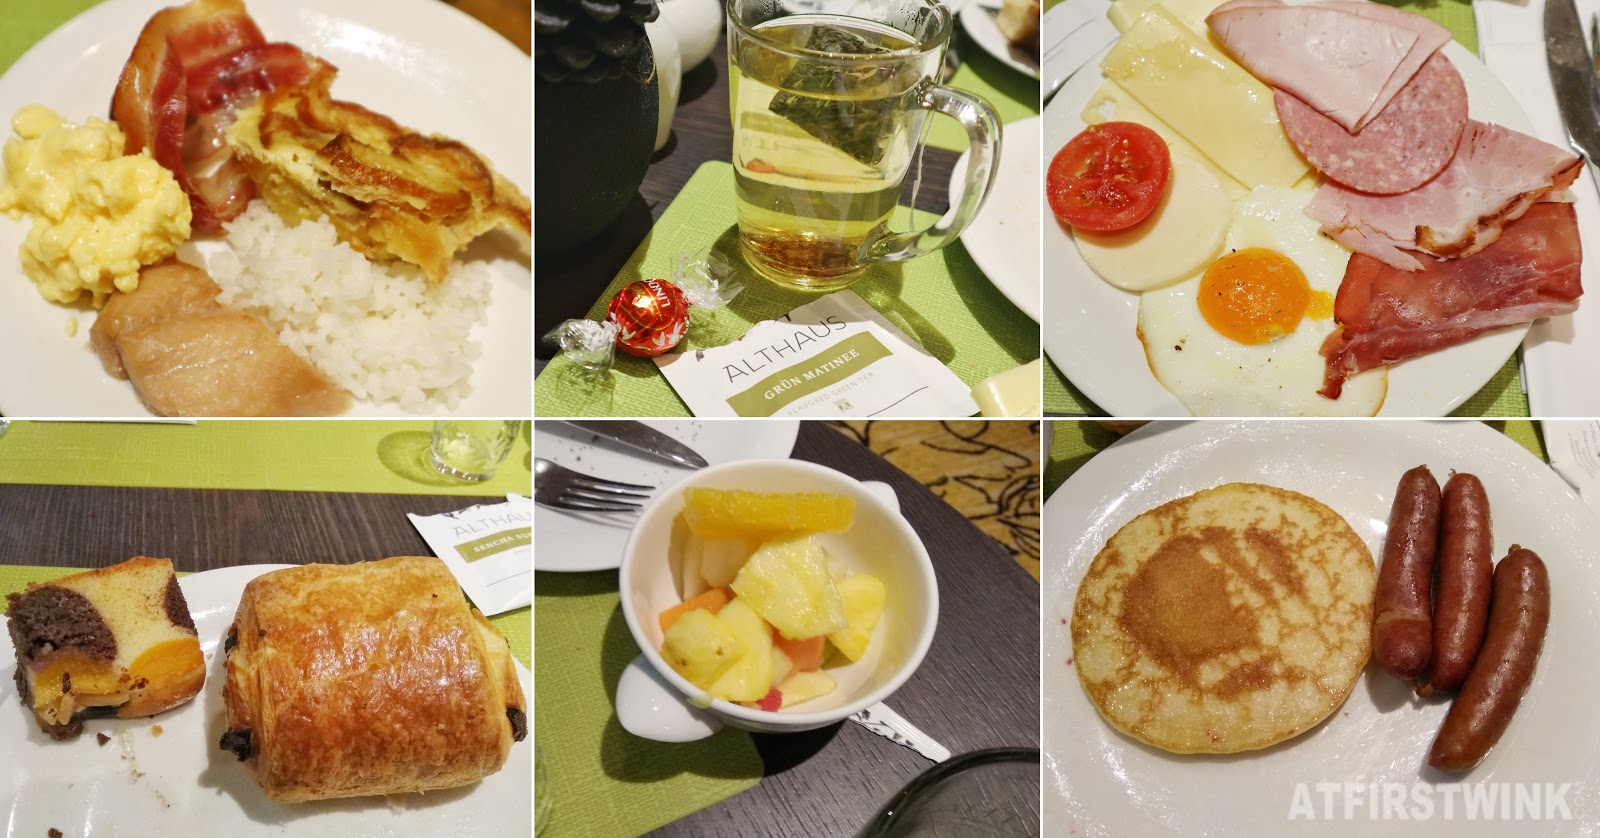 Hotel nikko dusseldorf breakfast buffet